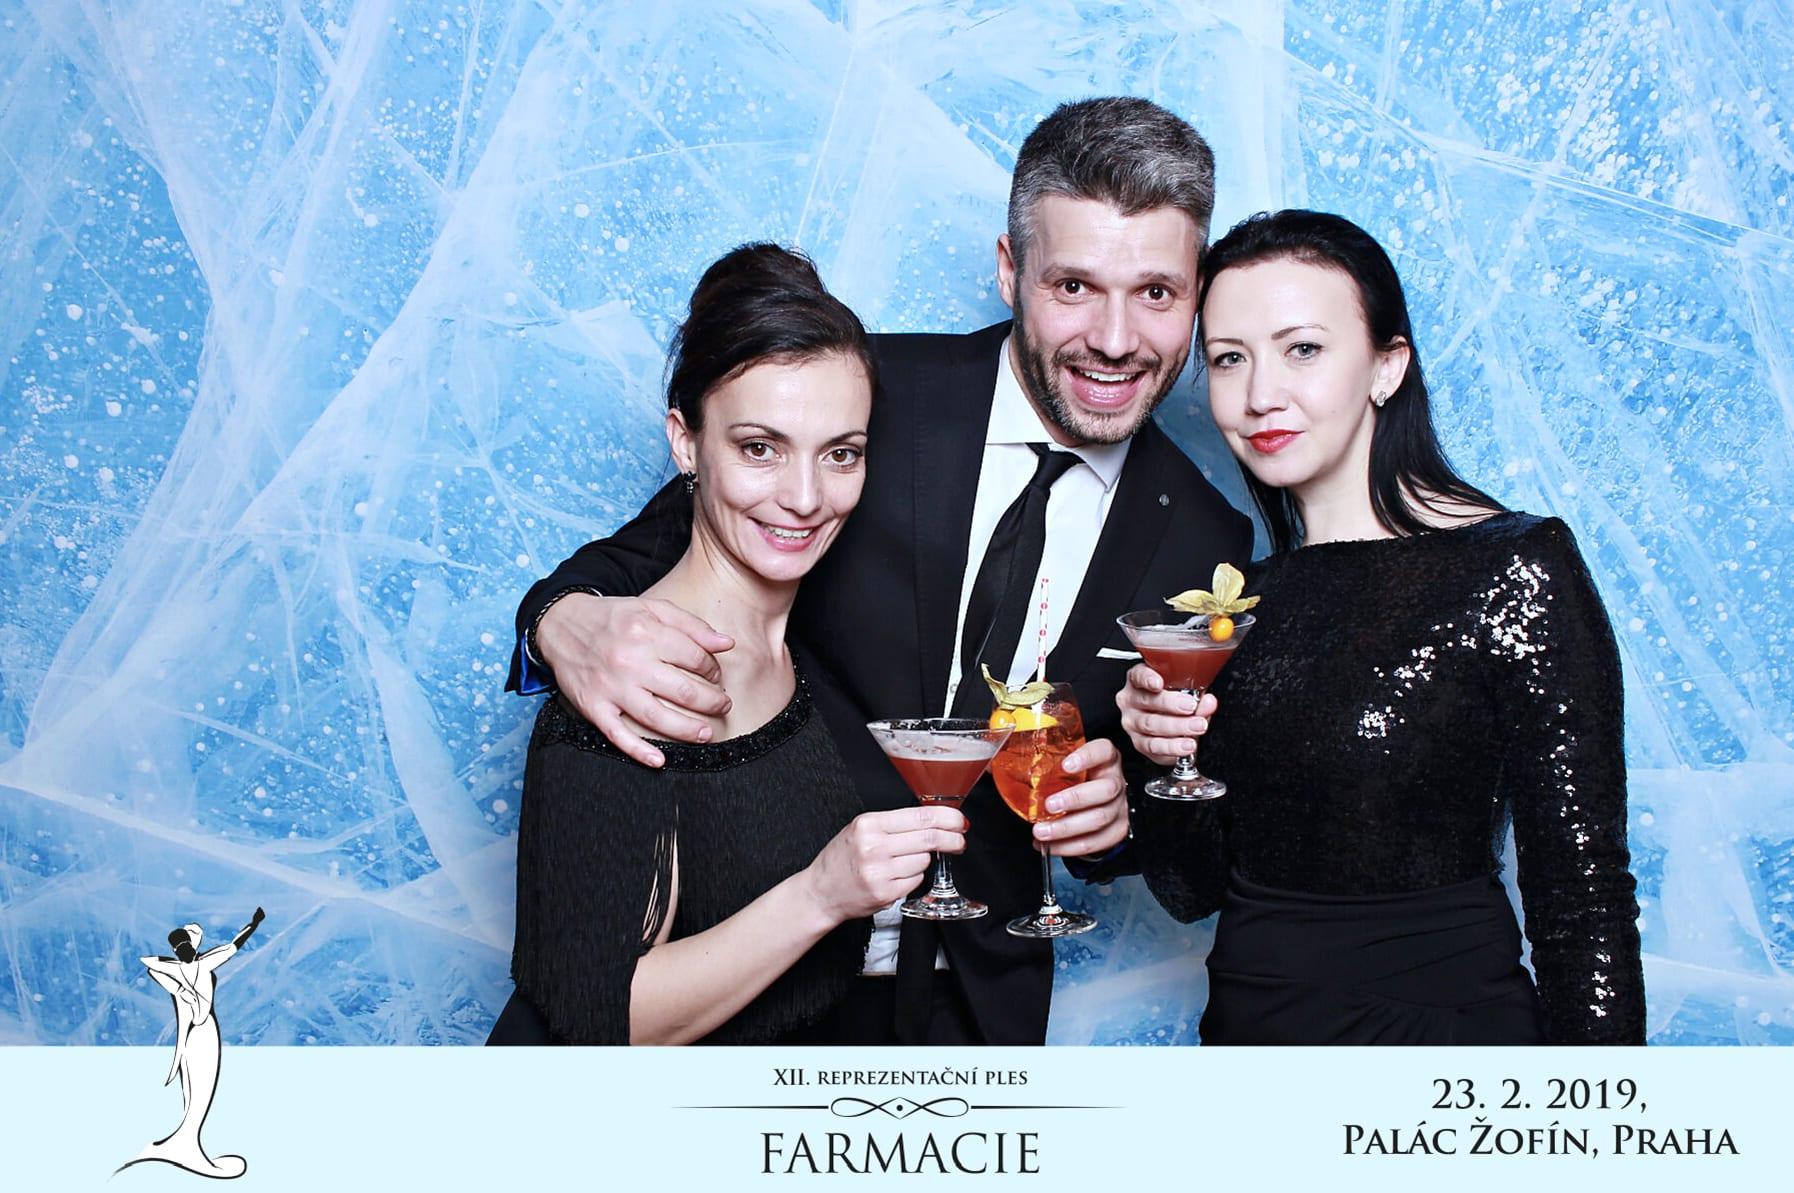 fotokoutek-xii-reprezentacni-ples-farmacie-23-2-2019-584359